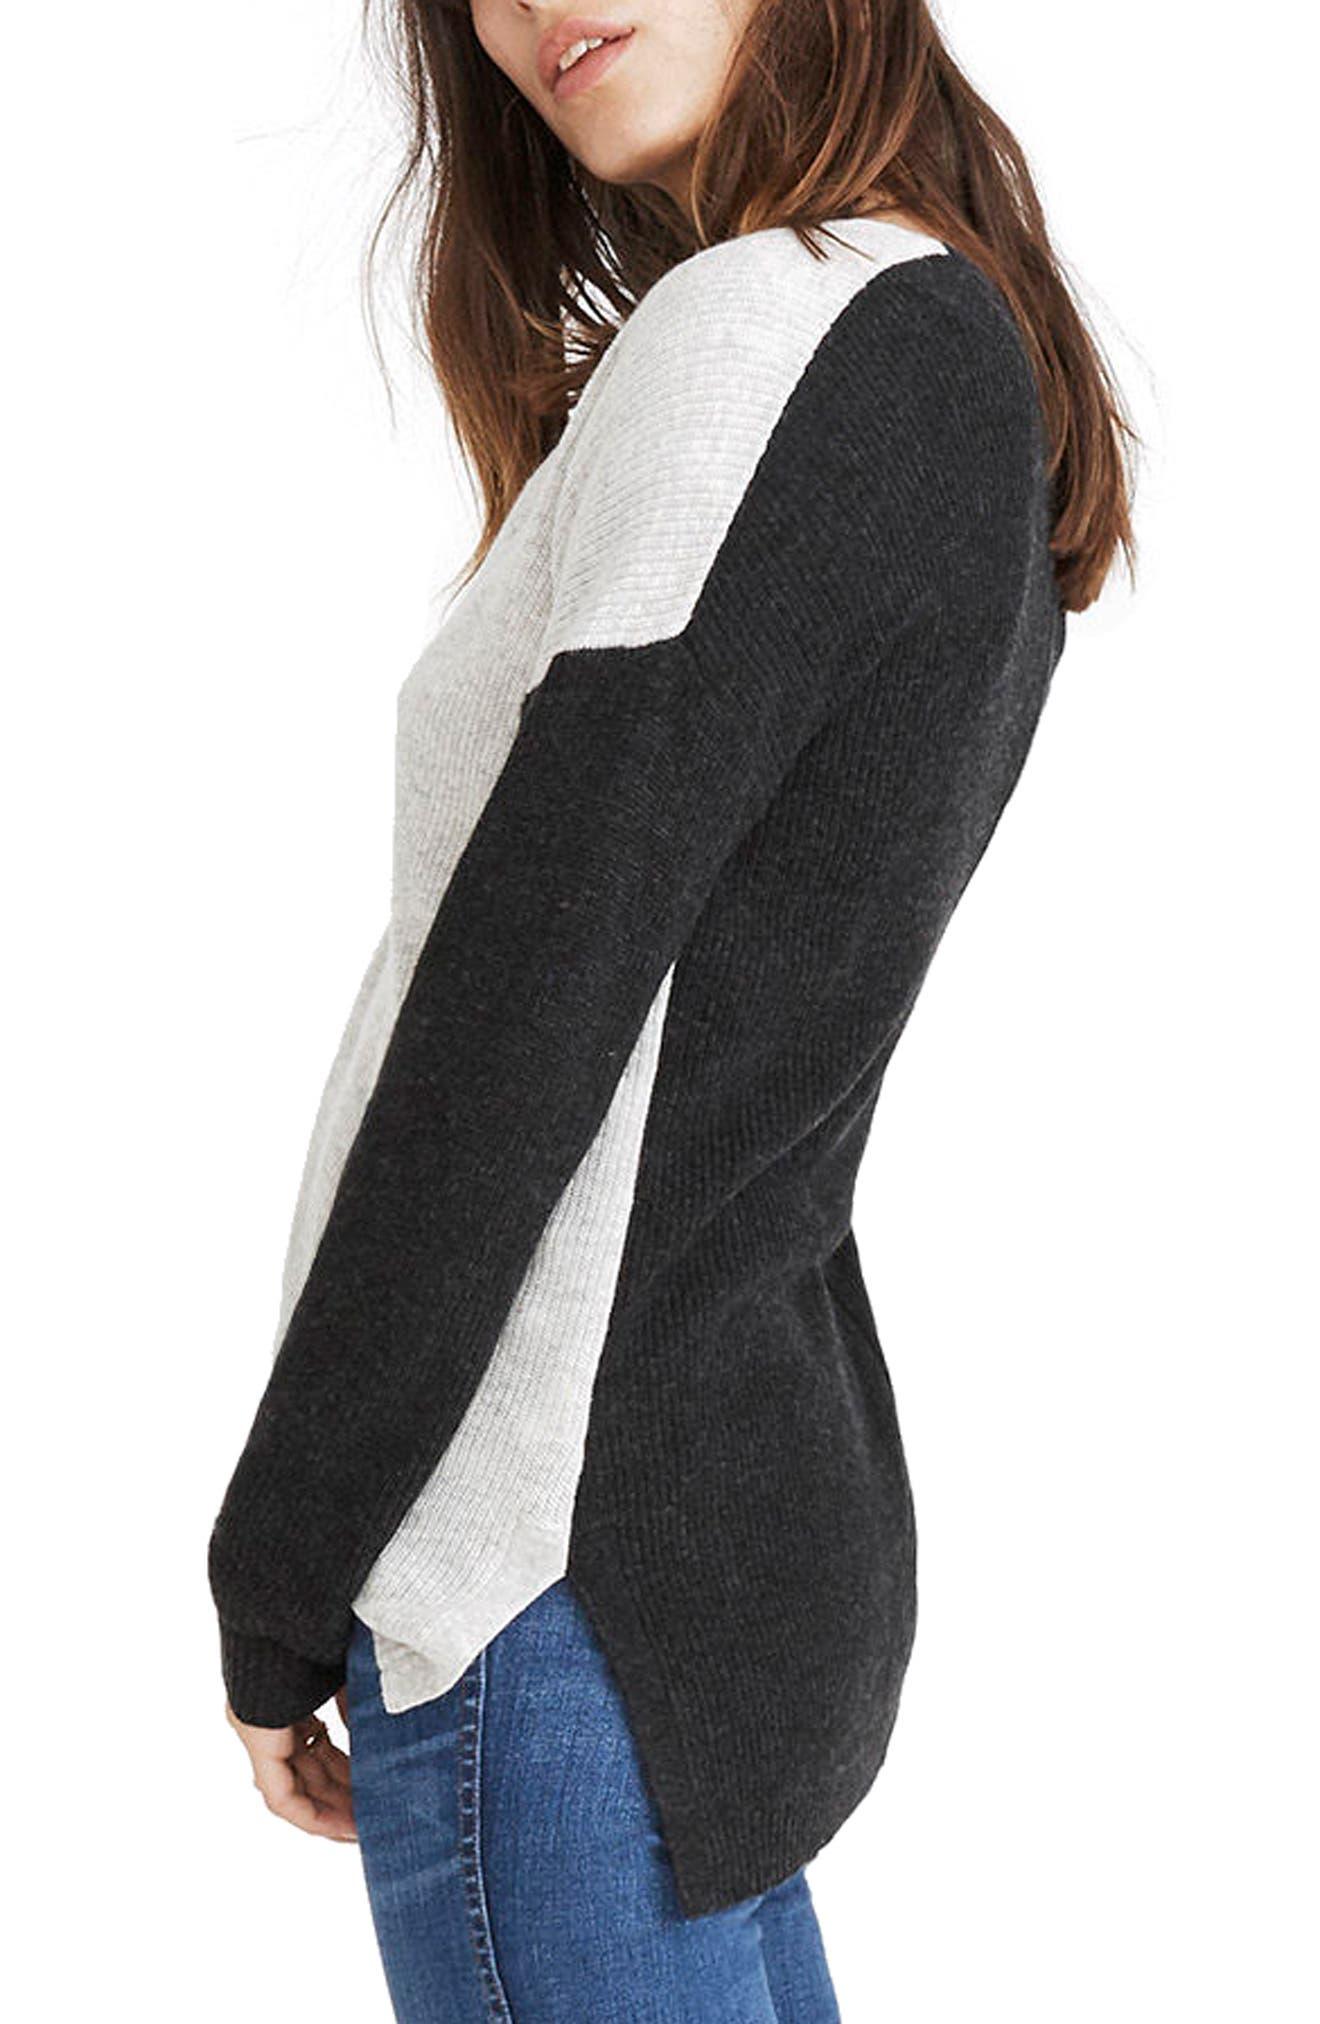 Warmlight Colorblock V-Neck Sweater,                             Alternate thumbnail 2, color,                             Heather Fog